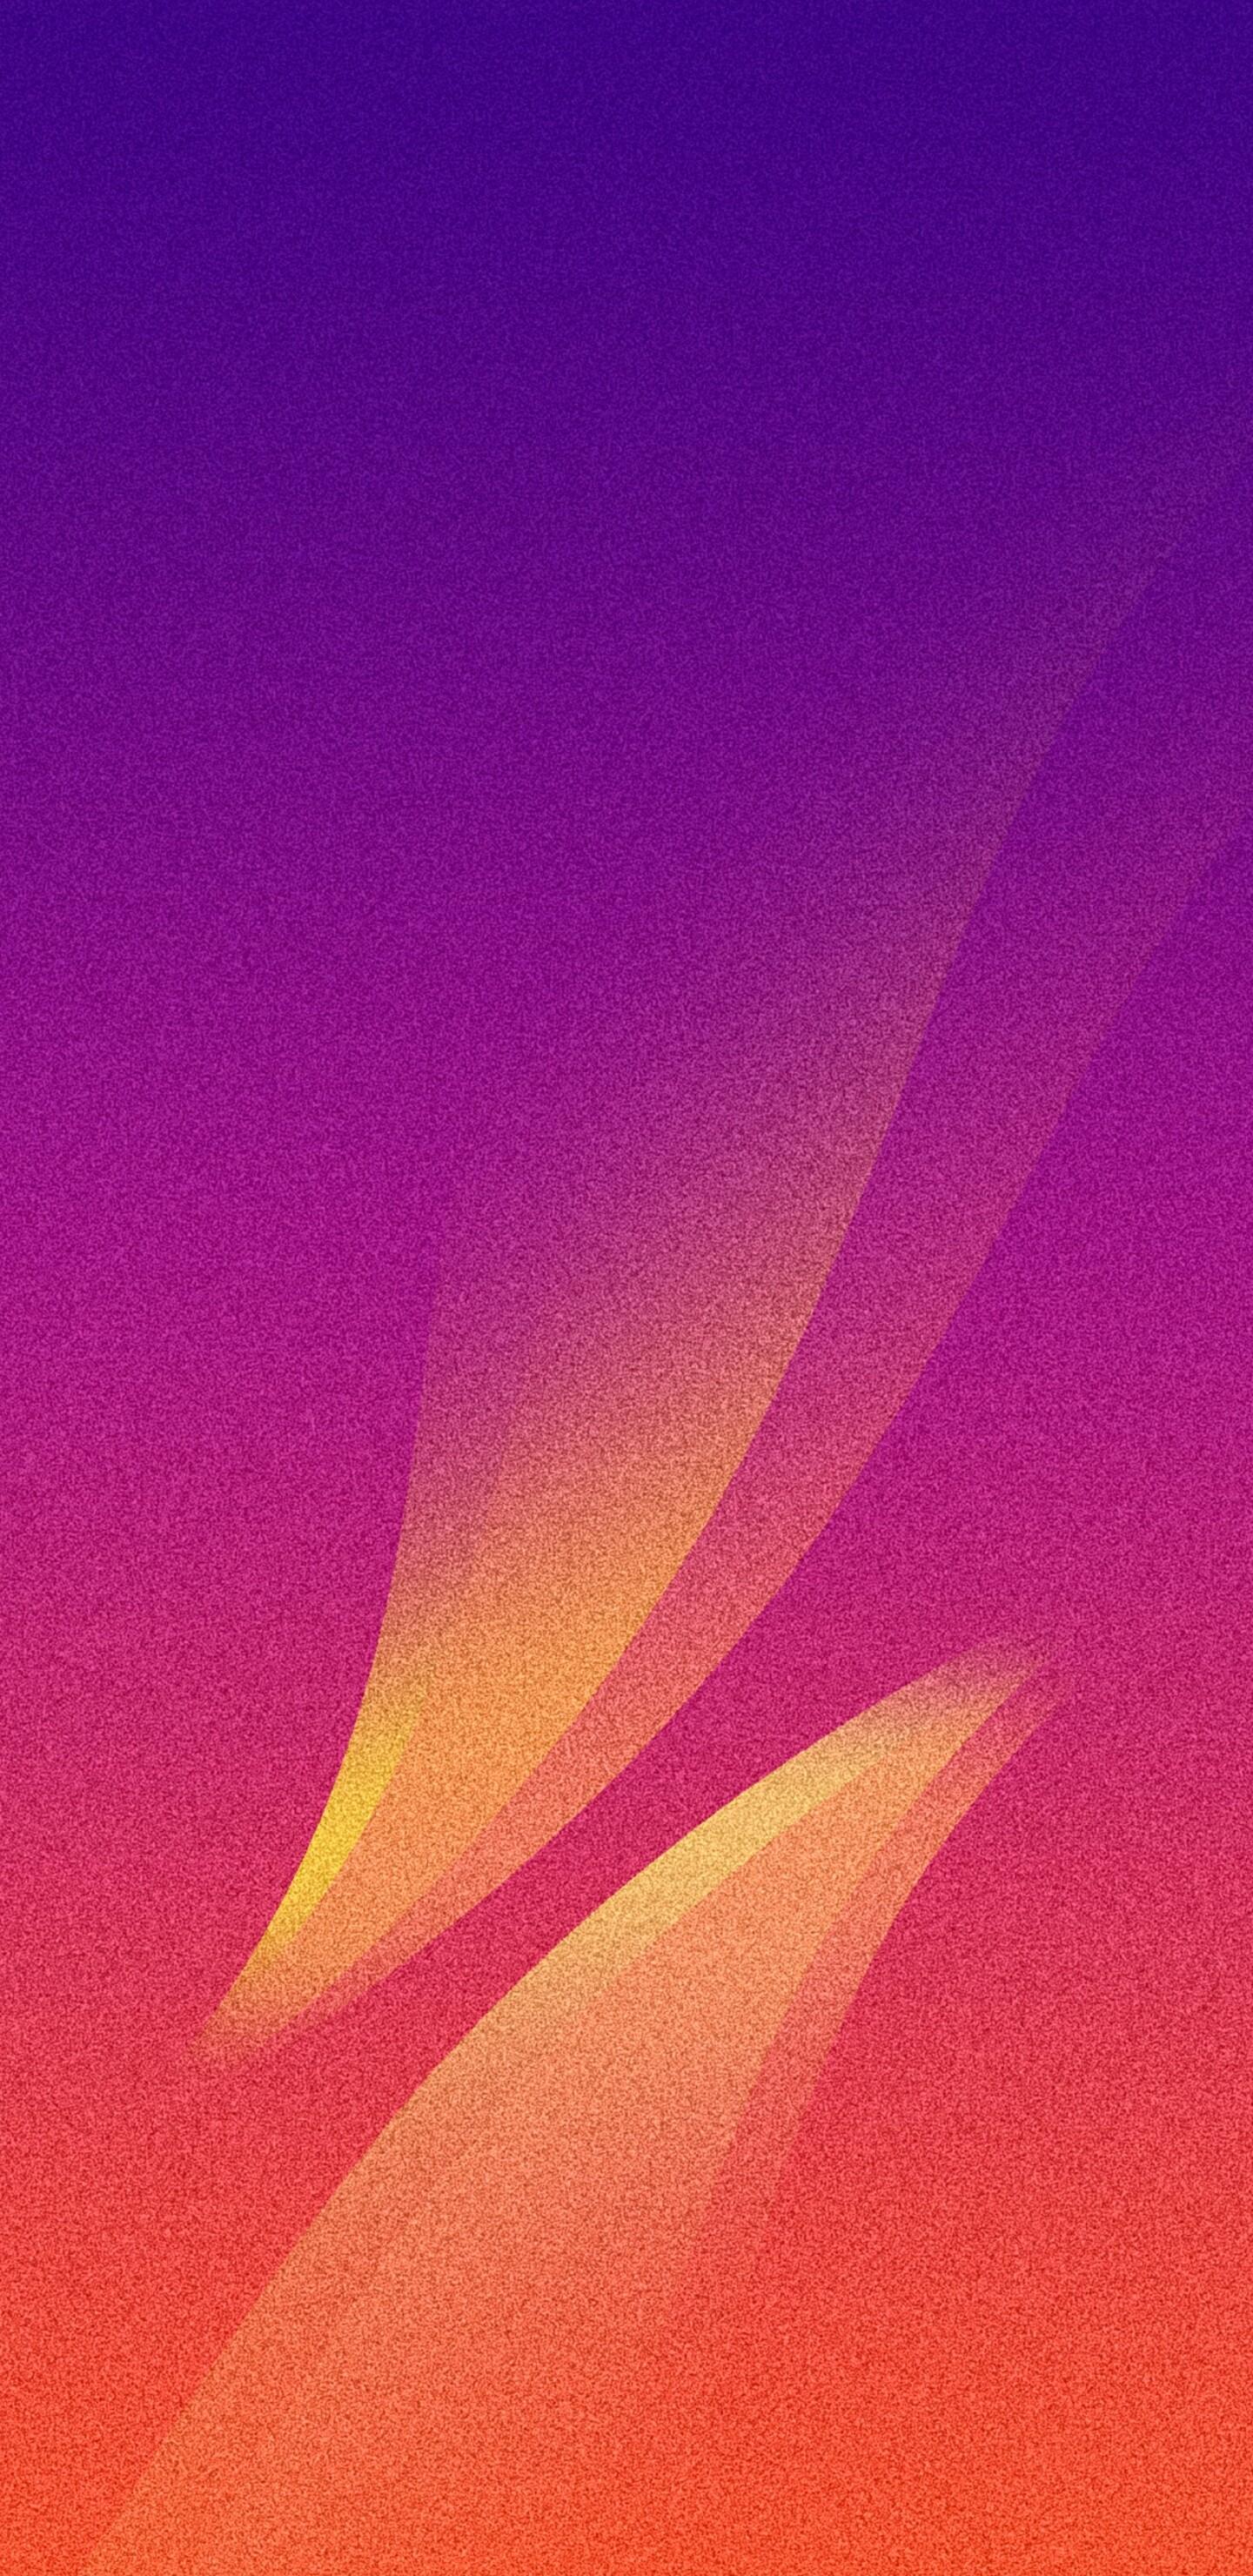 Oppo 3d Wallpaper 1440x2960 Hd Wallpaper 064